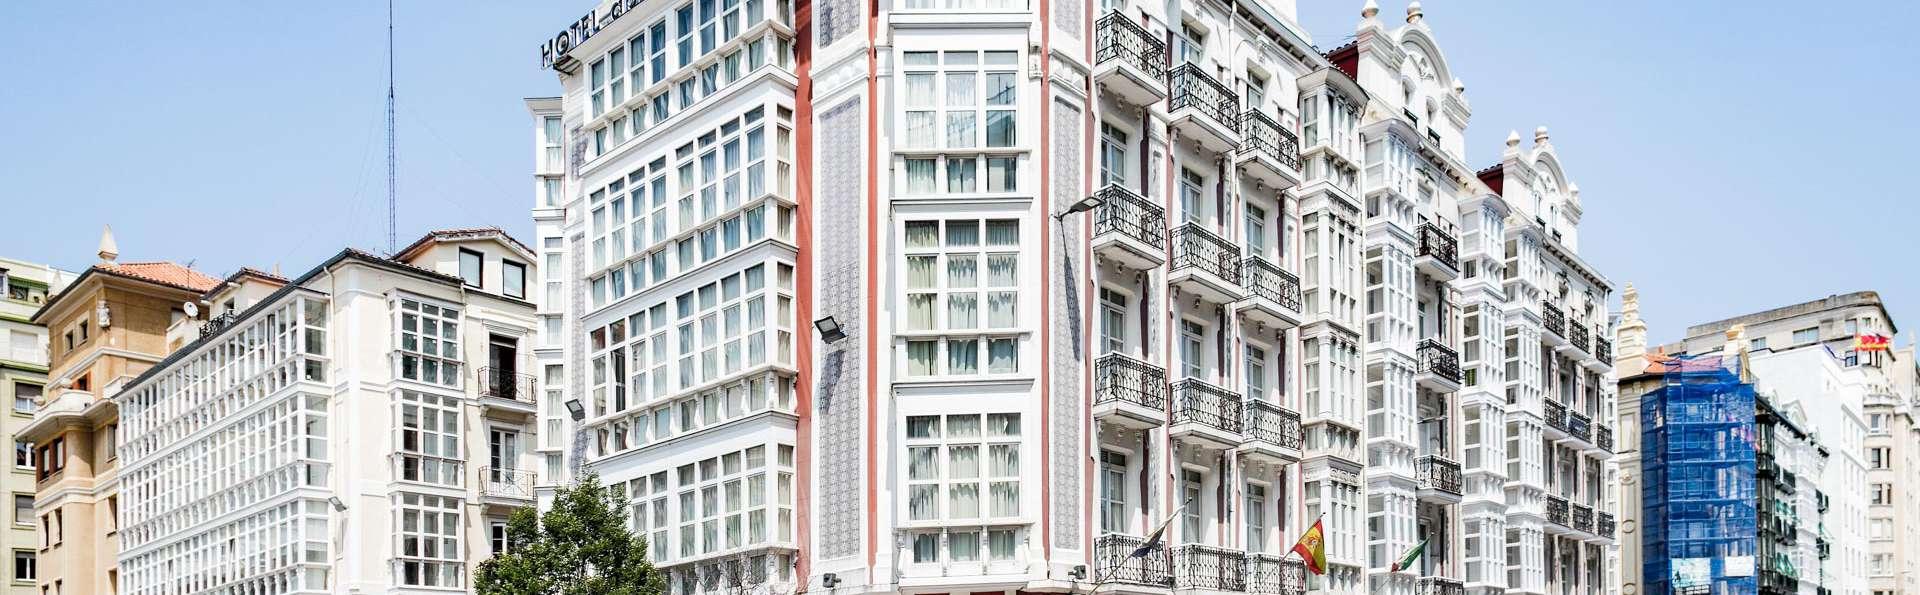 Hotel Abba Santander - EDIT_FRONT_03.jpg